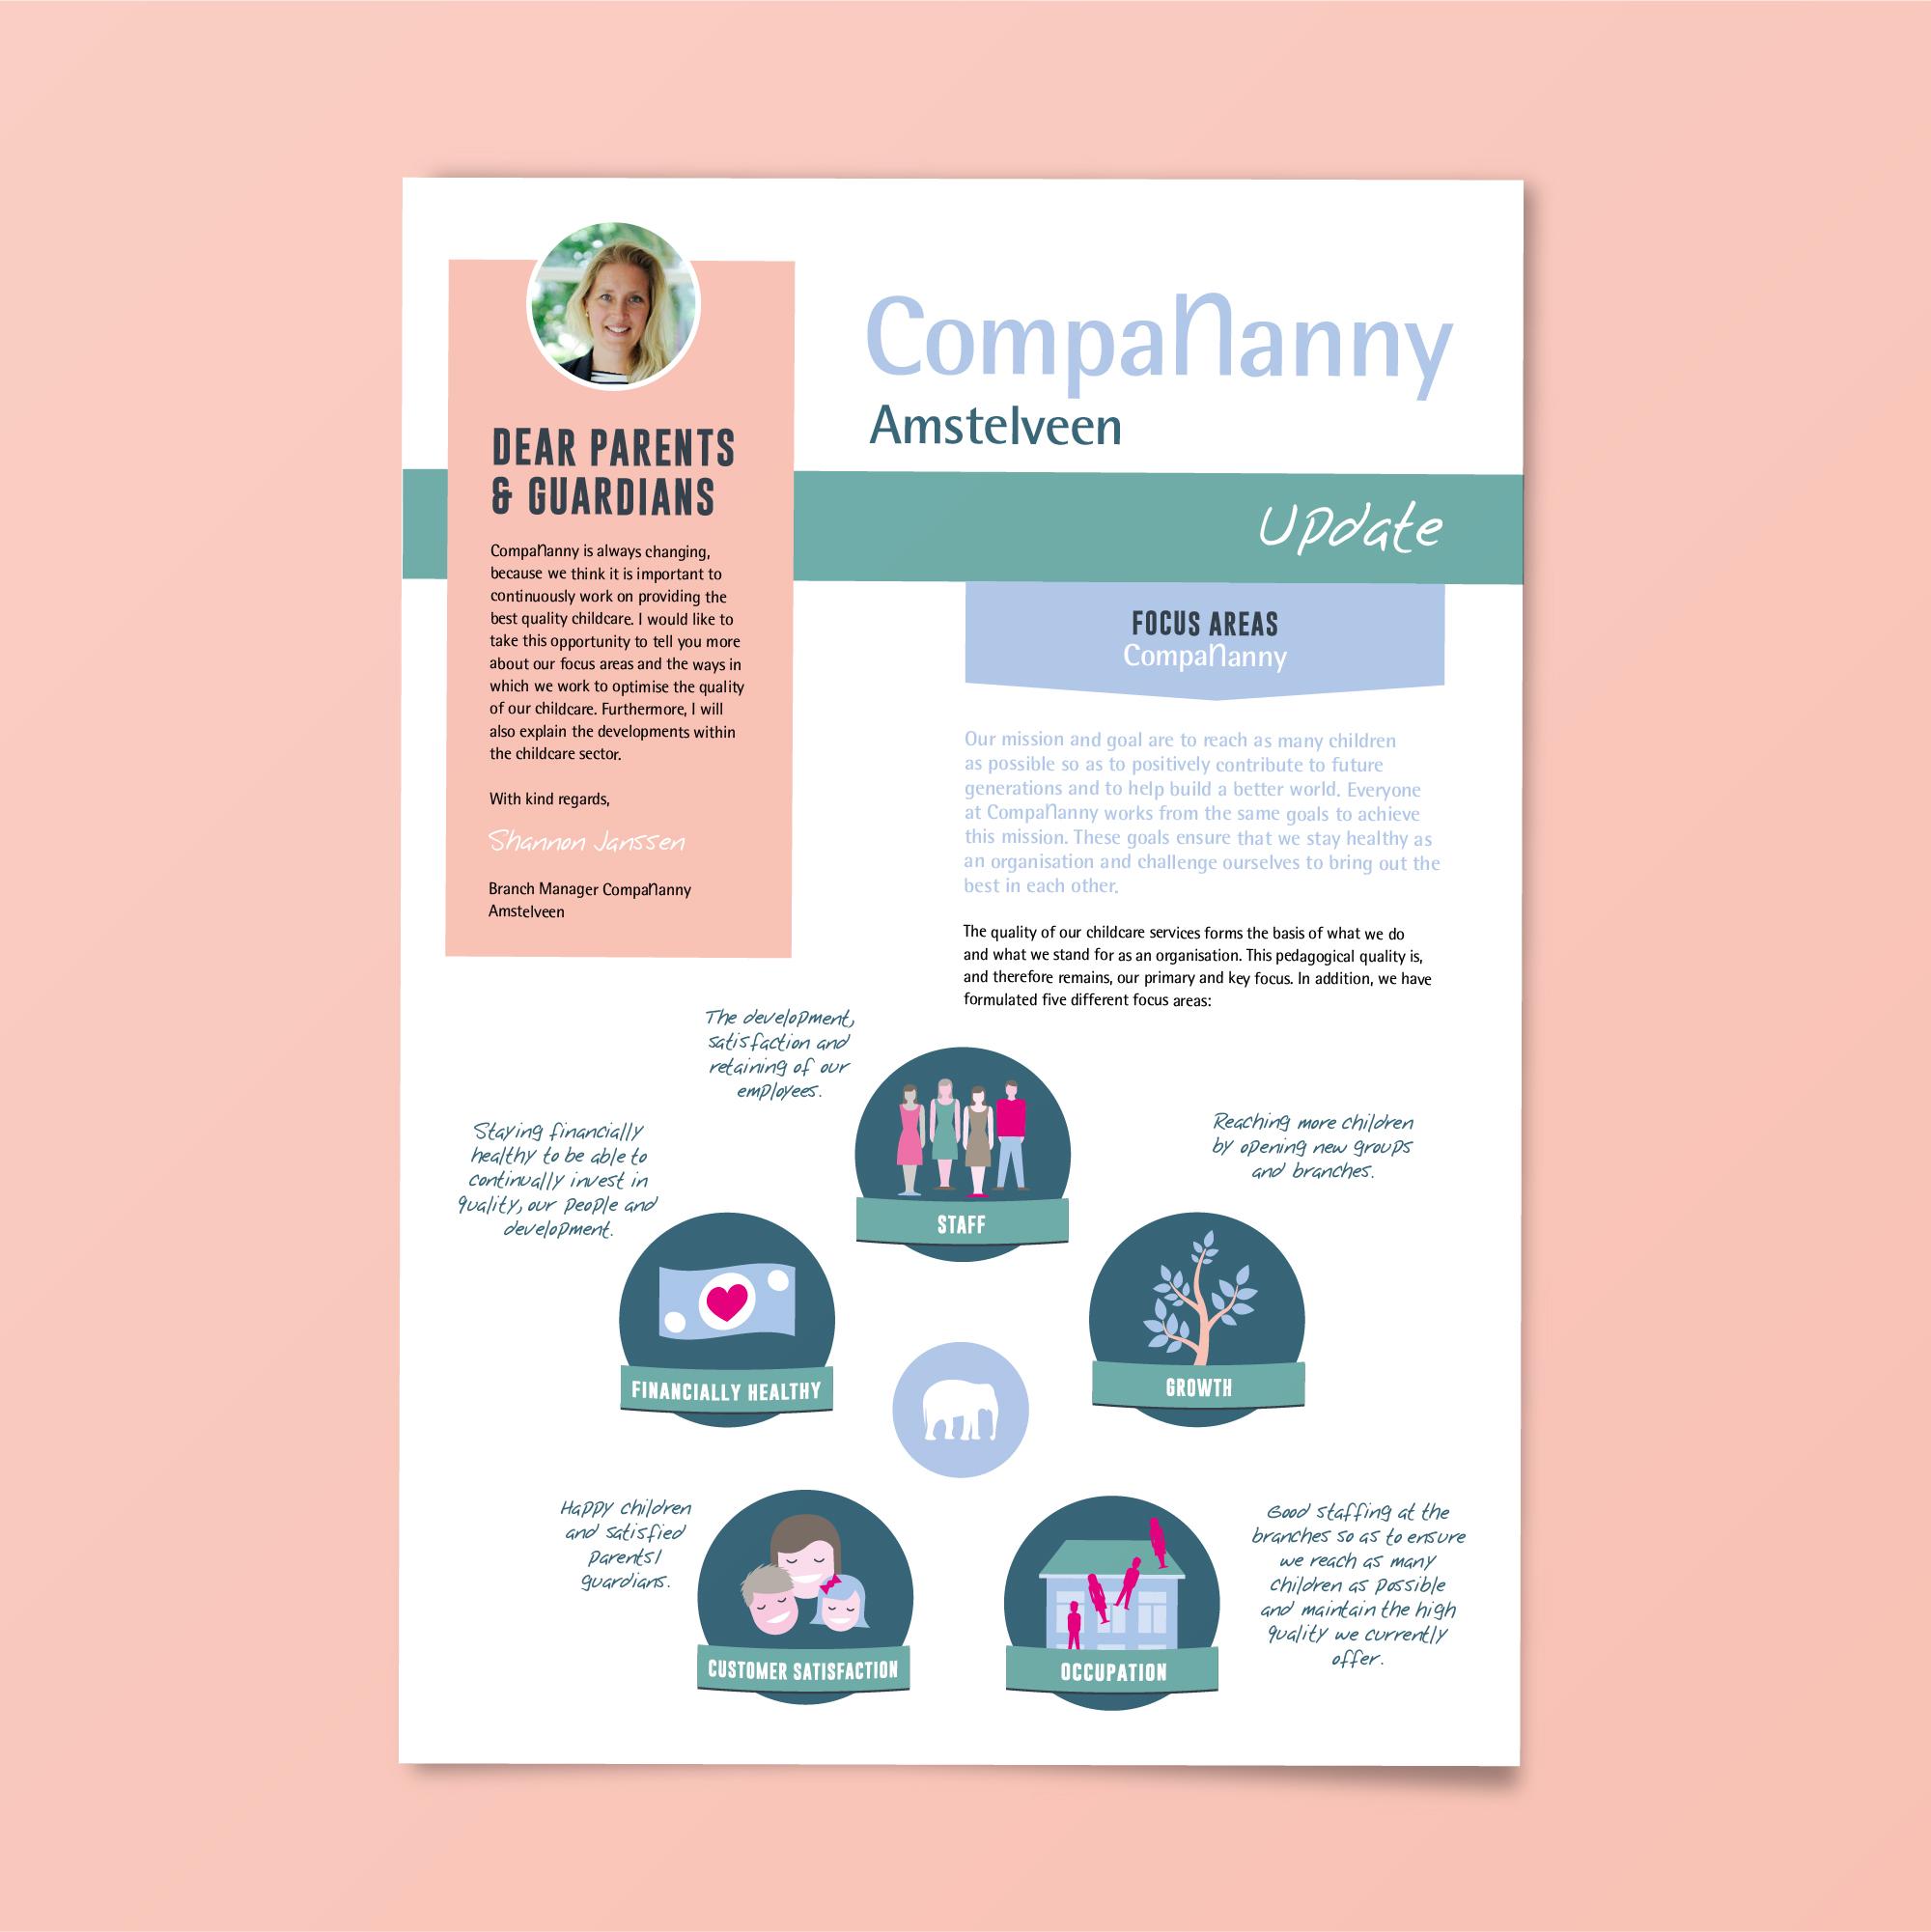 portfolio-dimgray-compananny-infographic-nannies-1